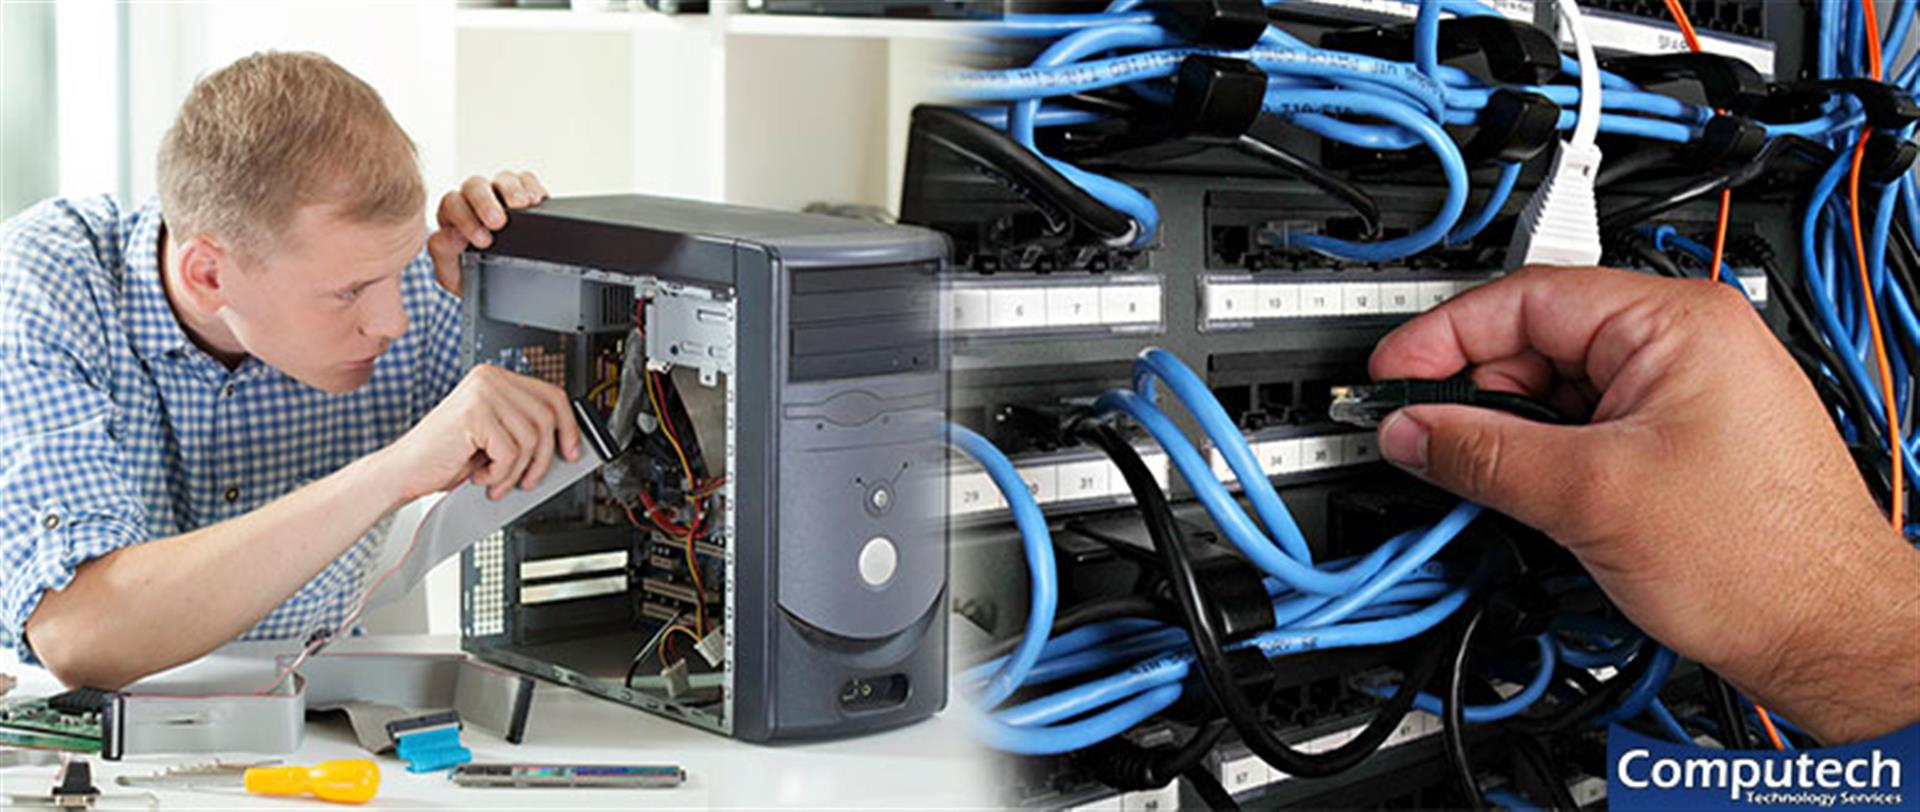 Sugar Hill Georgia On Site Computer PC & Printer Repair, Networks, Voice & Data Cabling Contractors